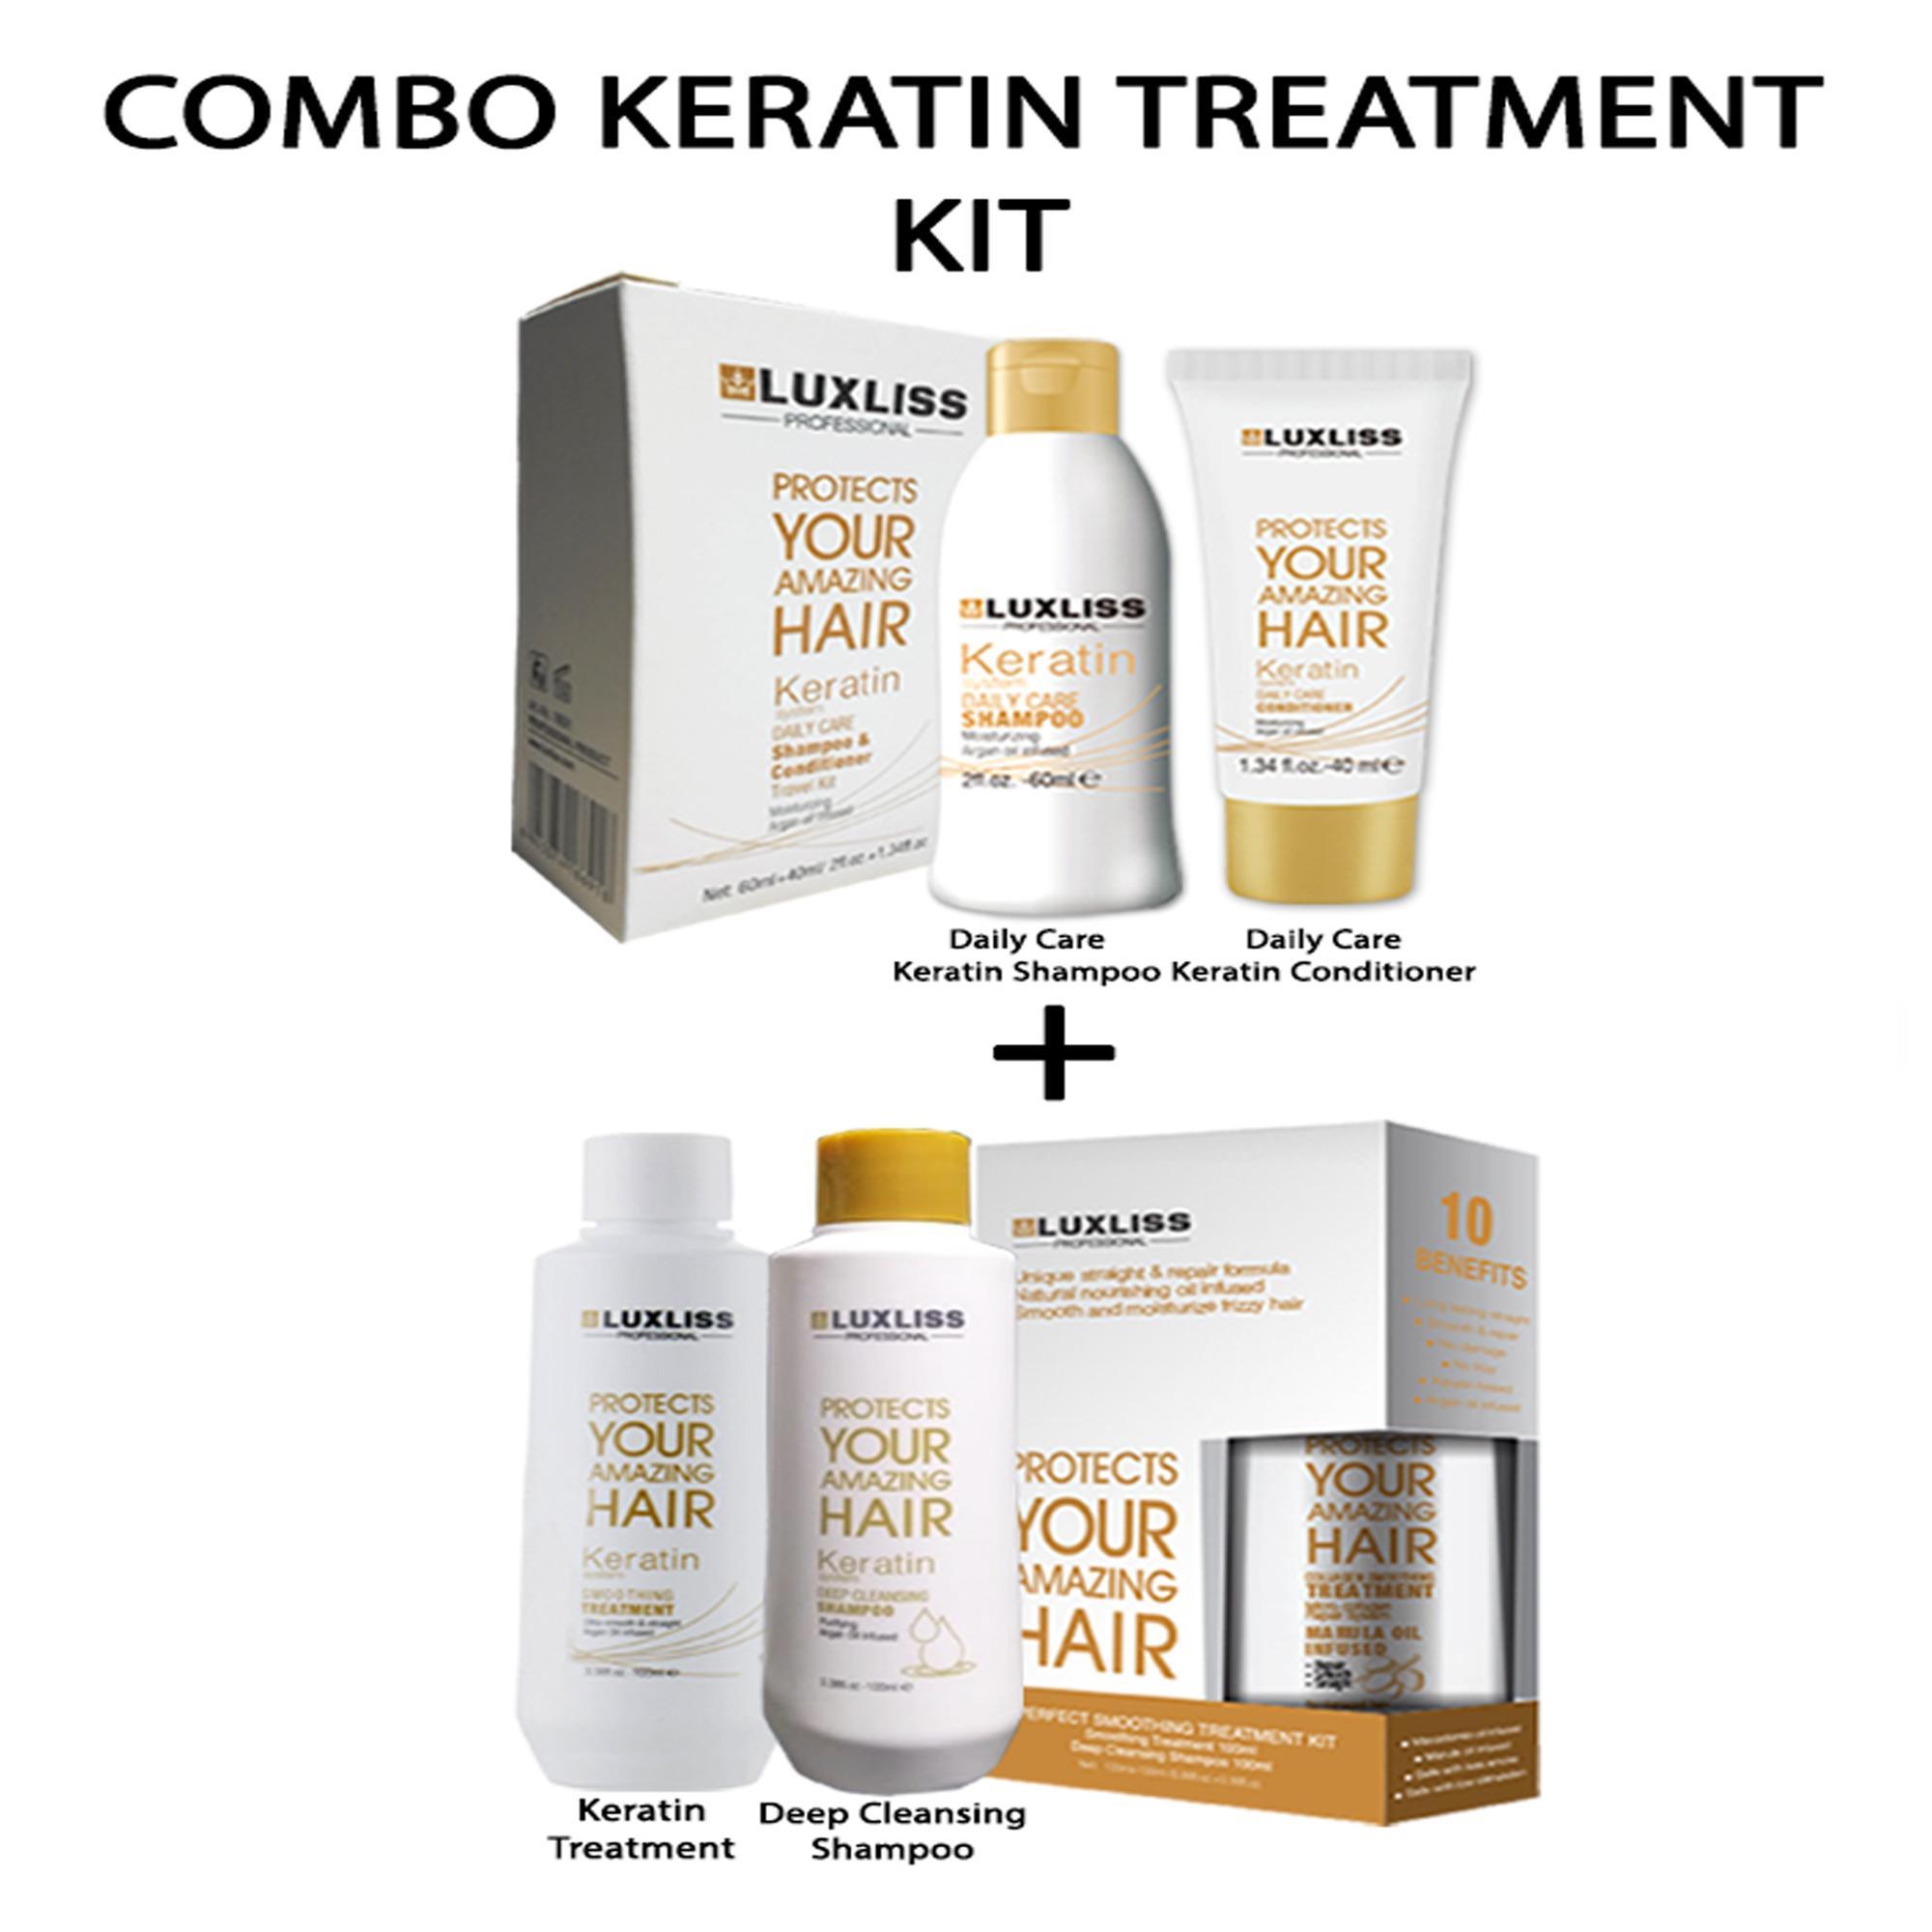 Combo Keratin Treatment Buy Online At Best Prices In Pakistan Daraz Pk